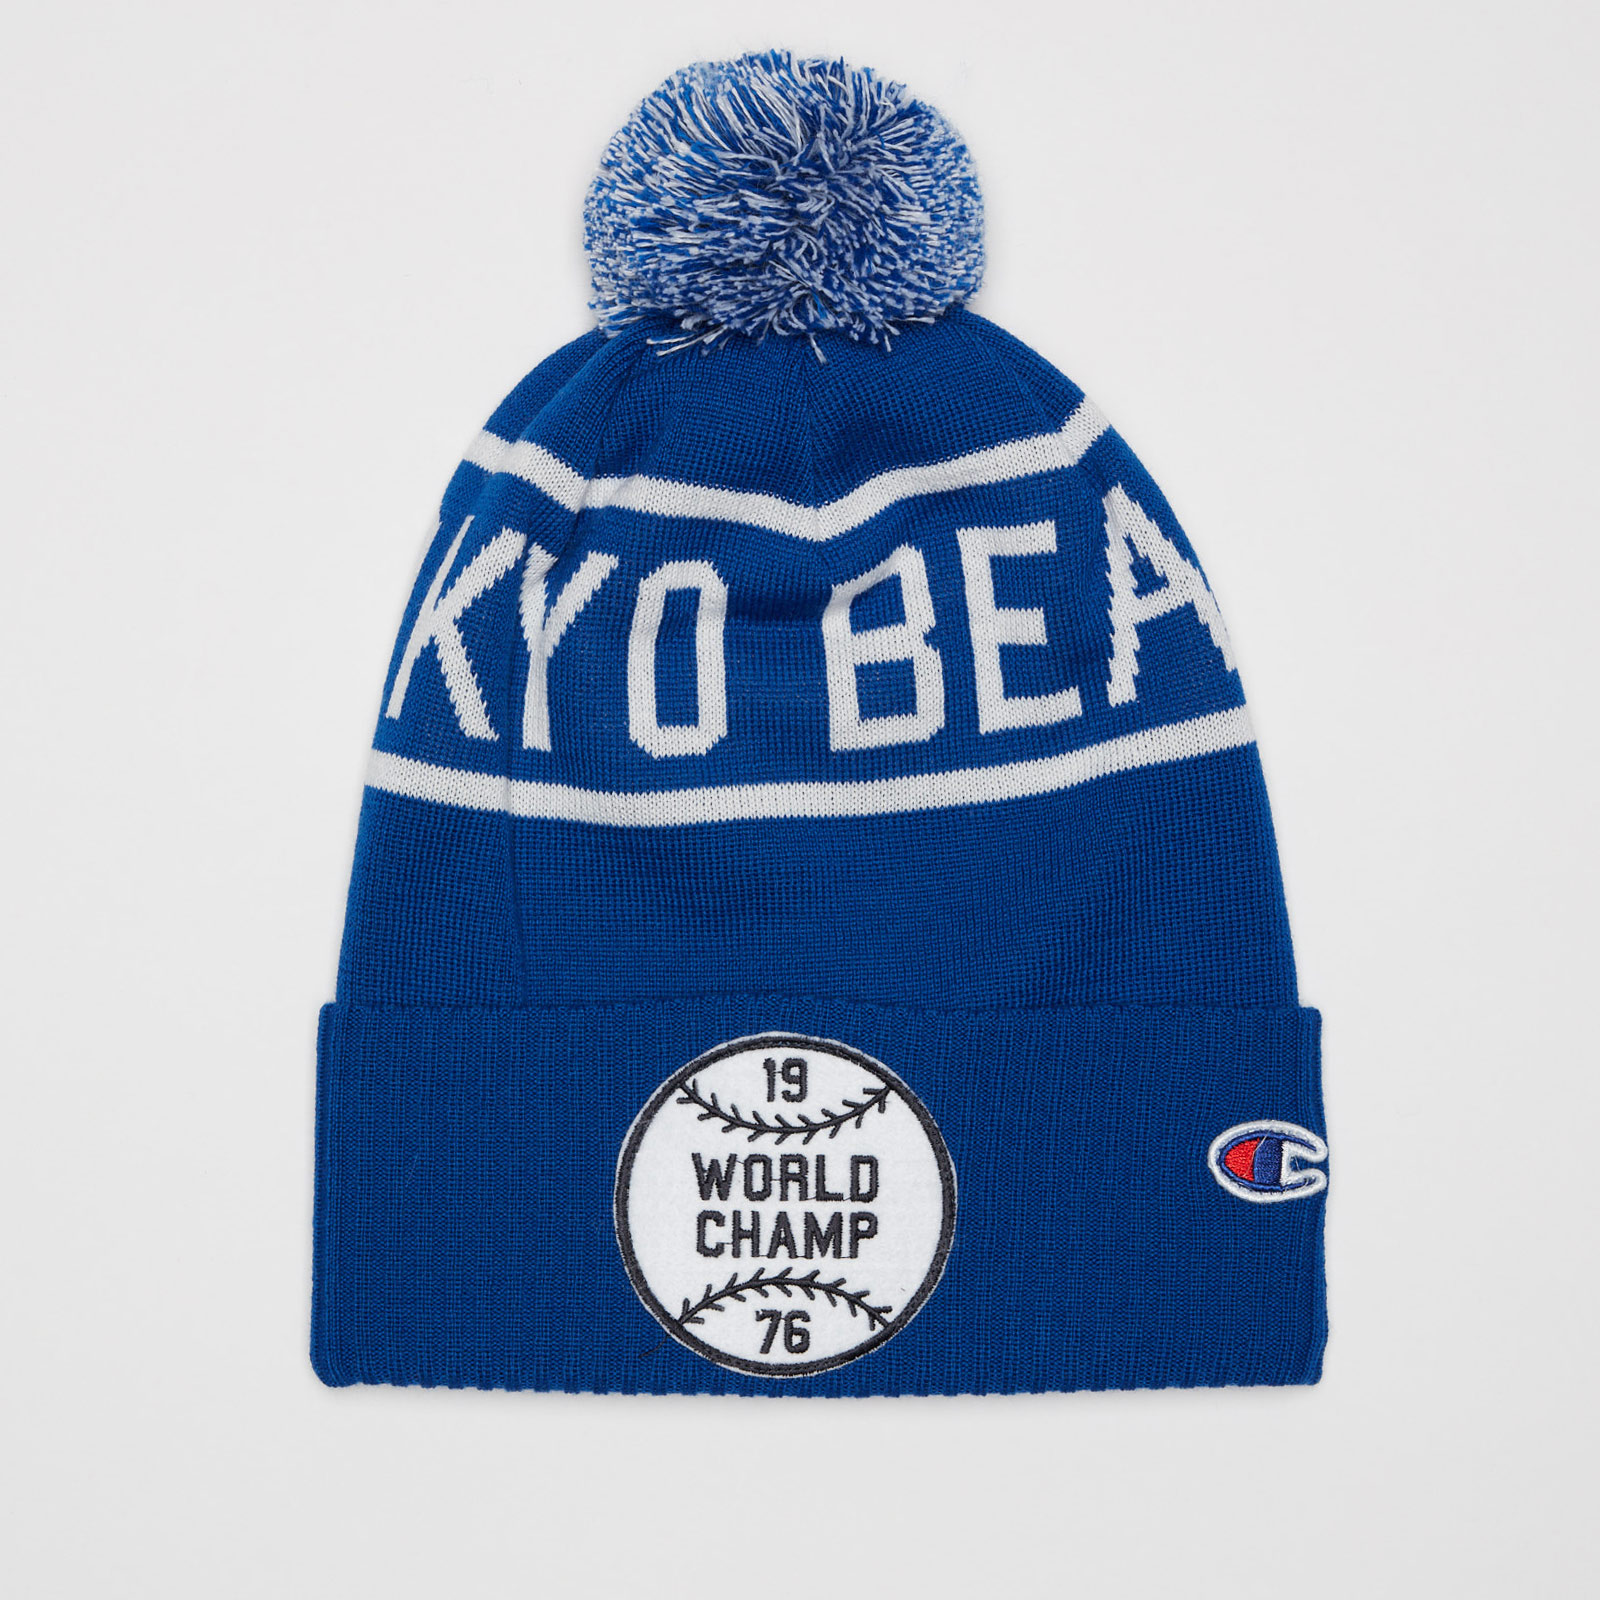 Champion Wool Beanie x BEAMS - 804465-bs086 - Sneakersnstuff ... ef4be7a6df1d